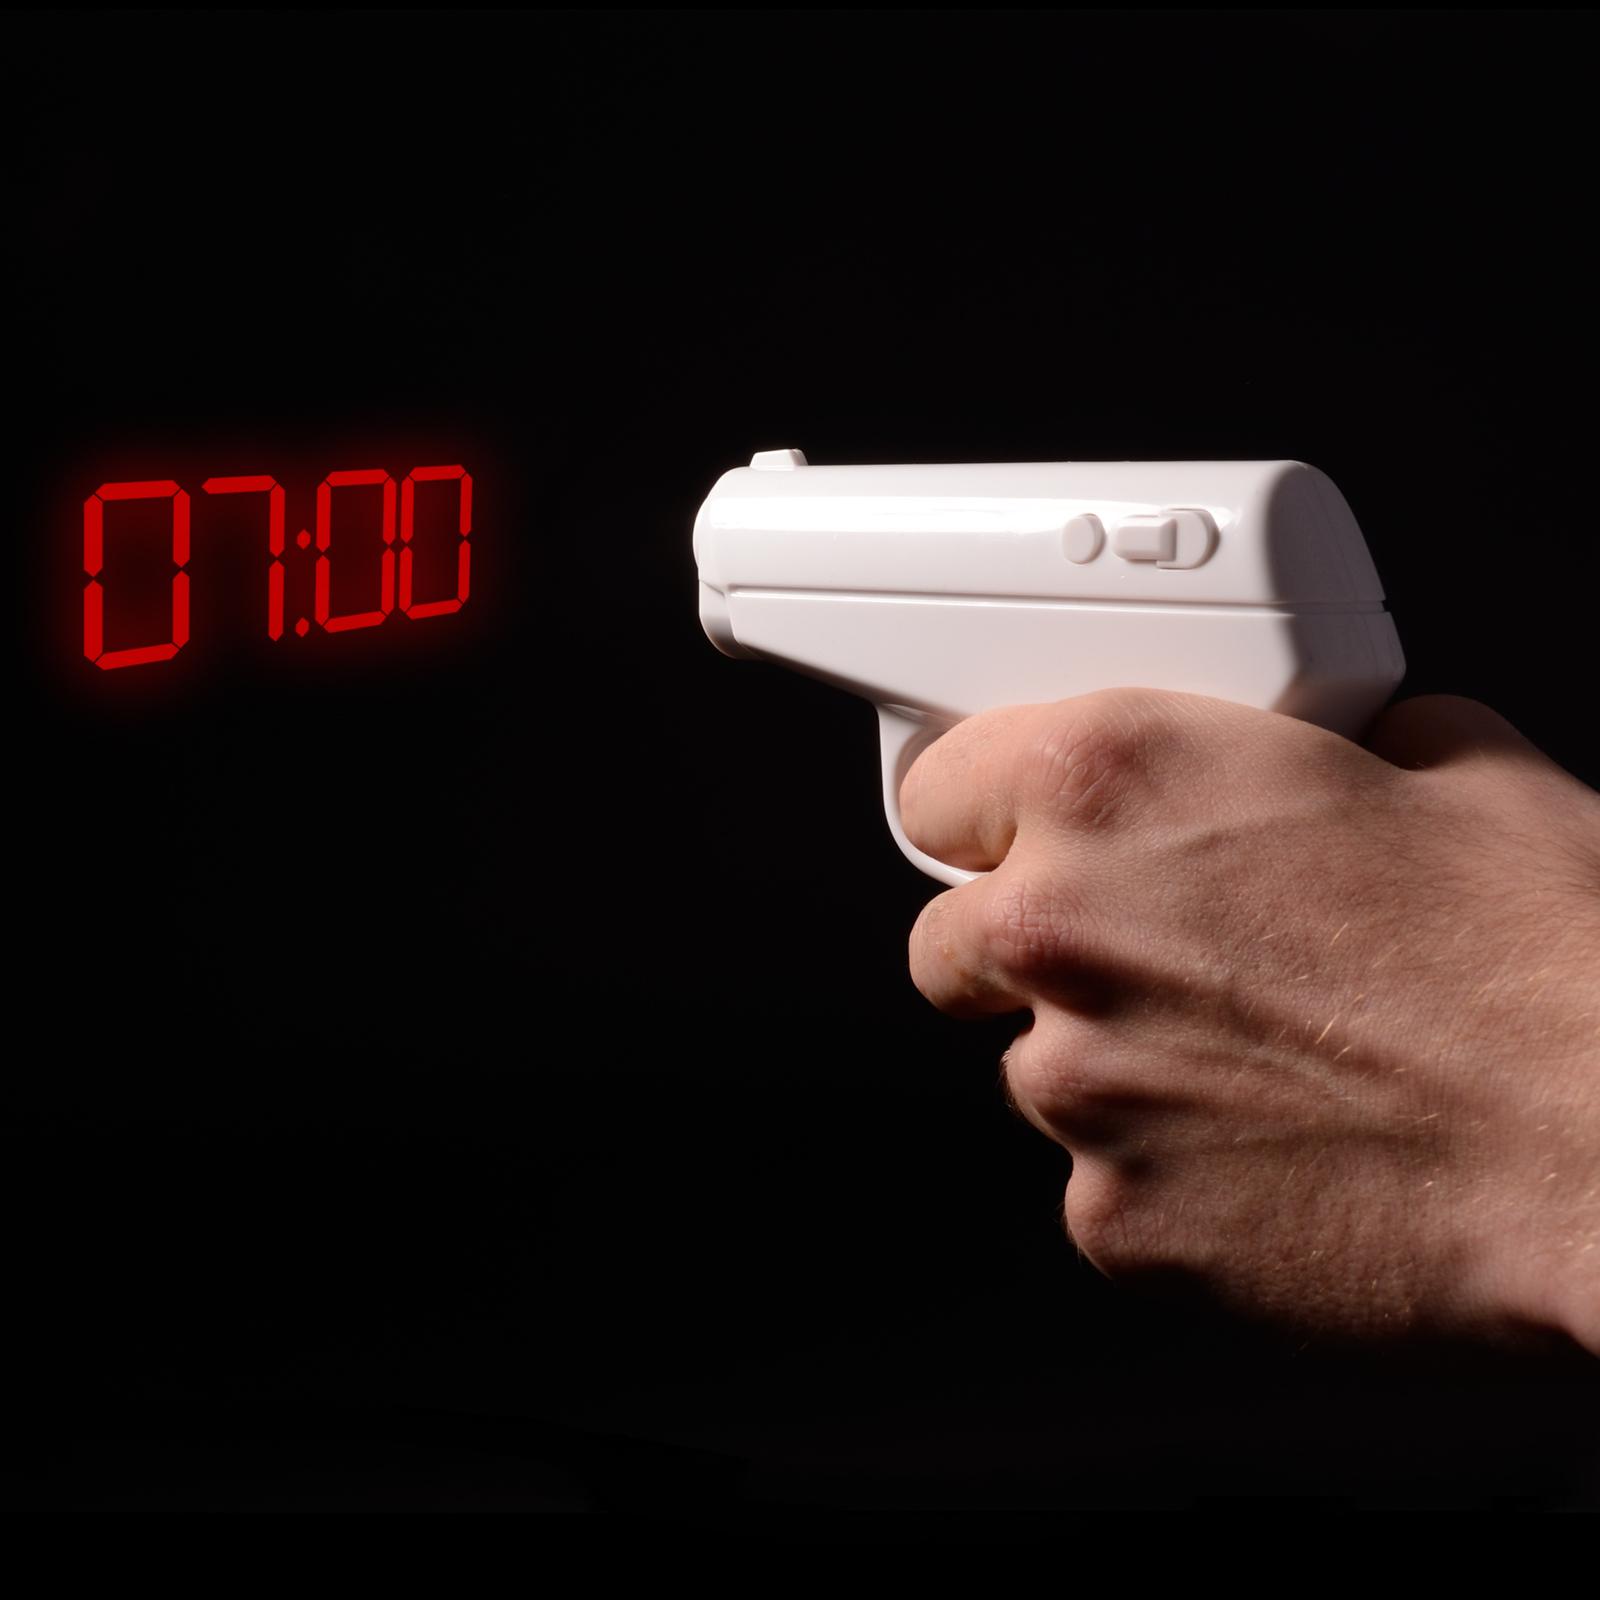 Thumbs Up! Secret Agent Alarm Clock image